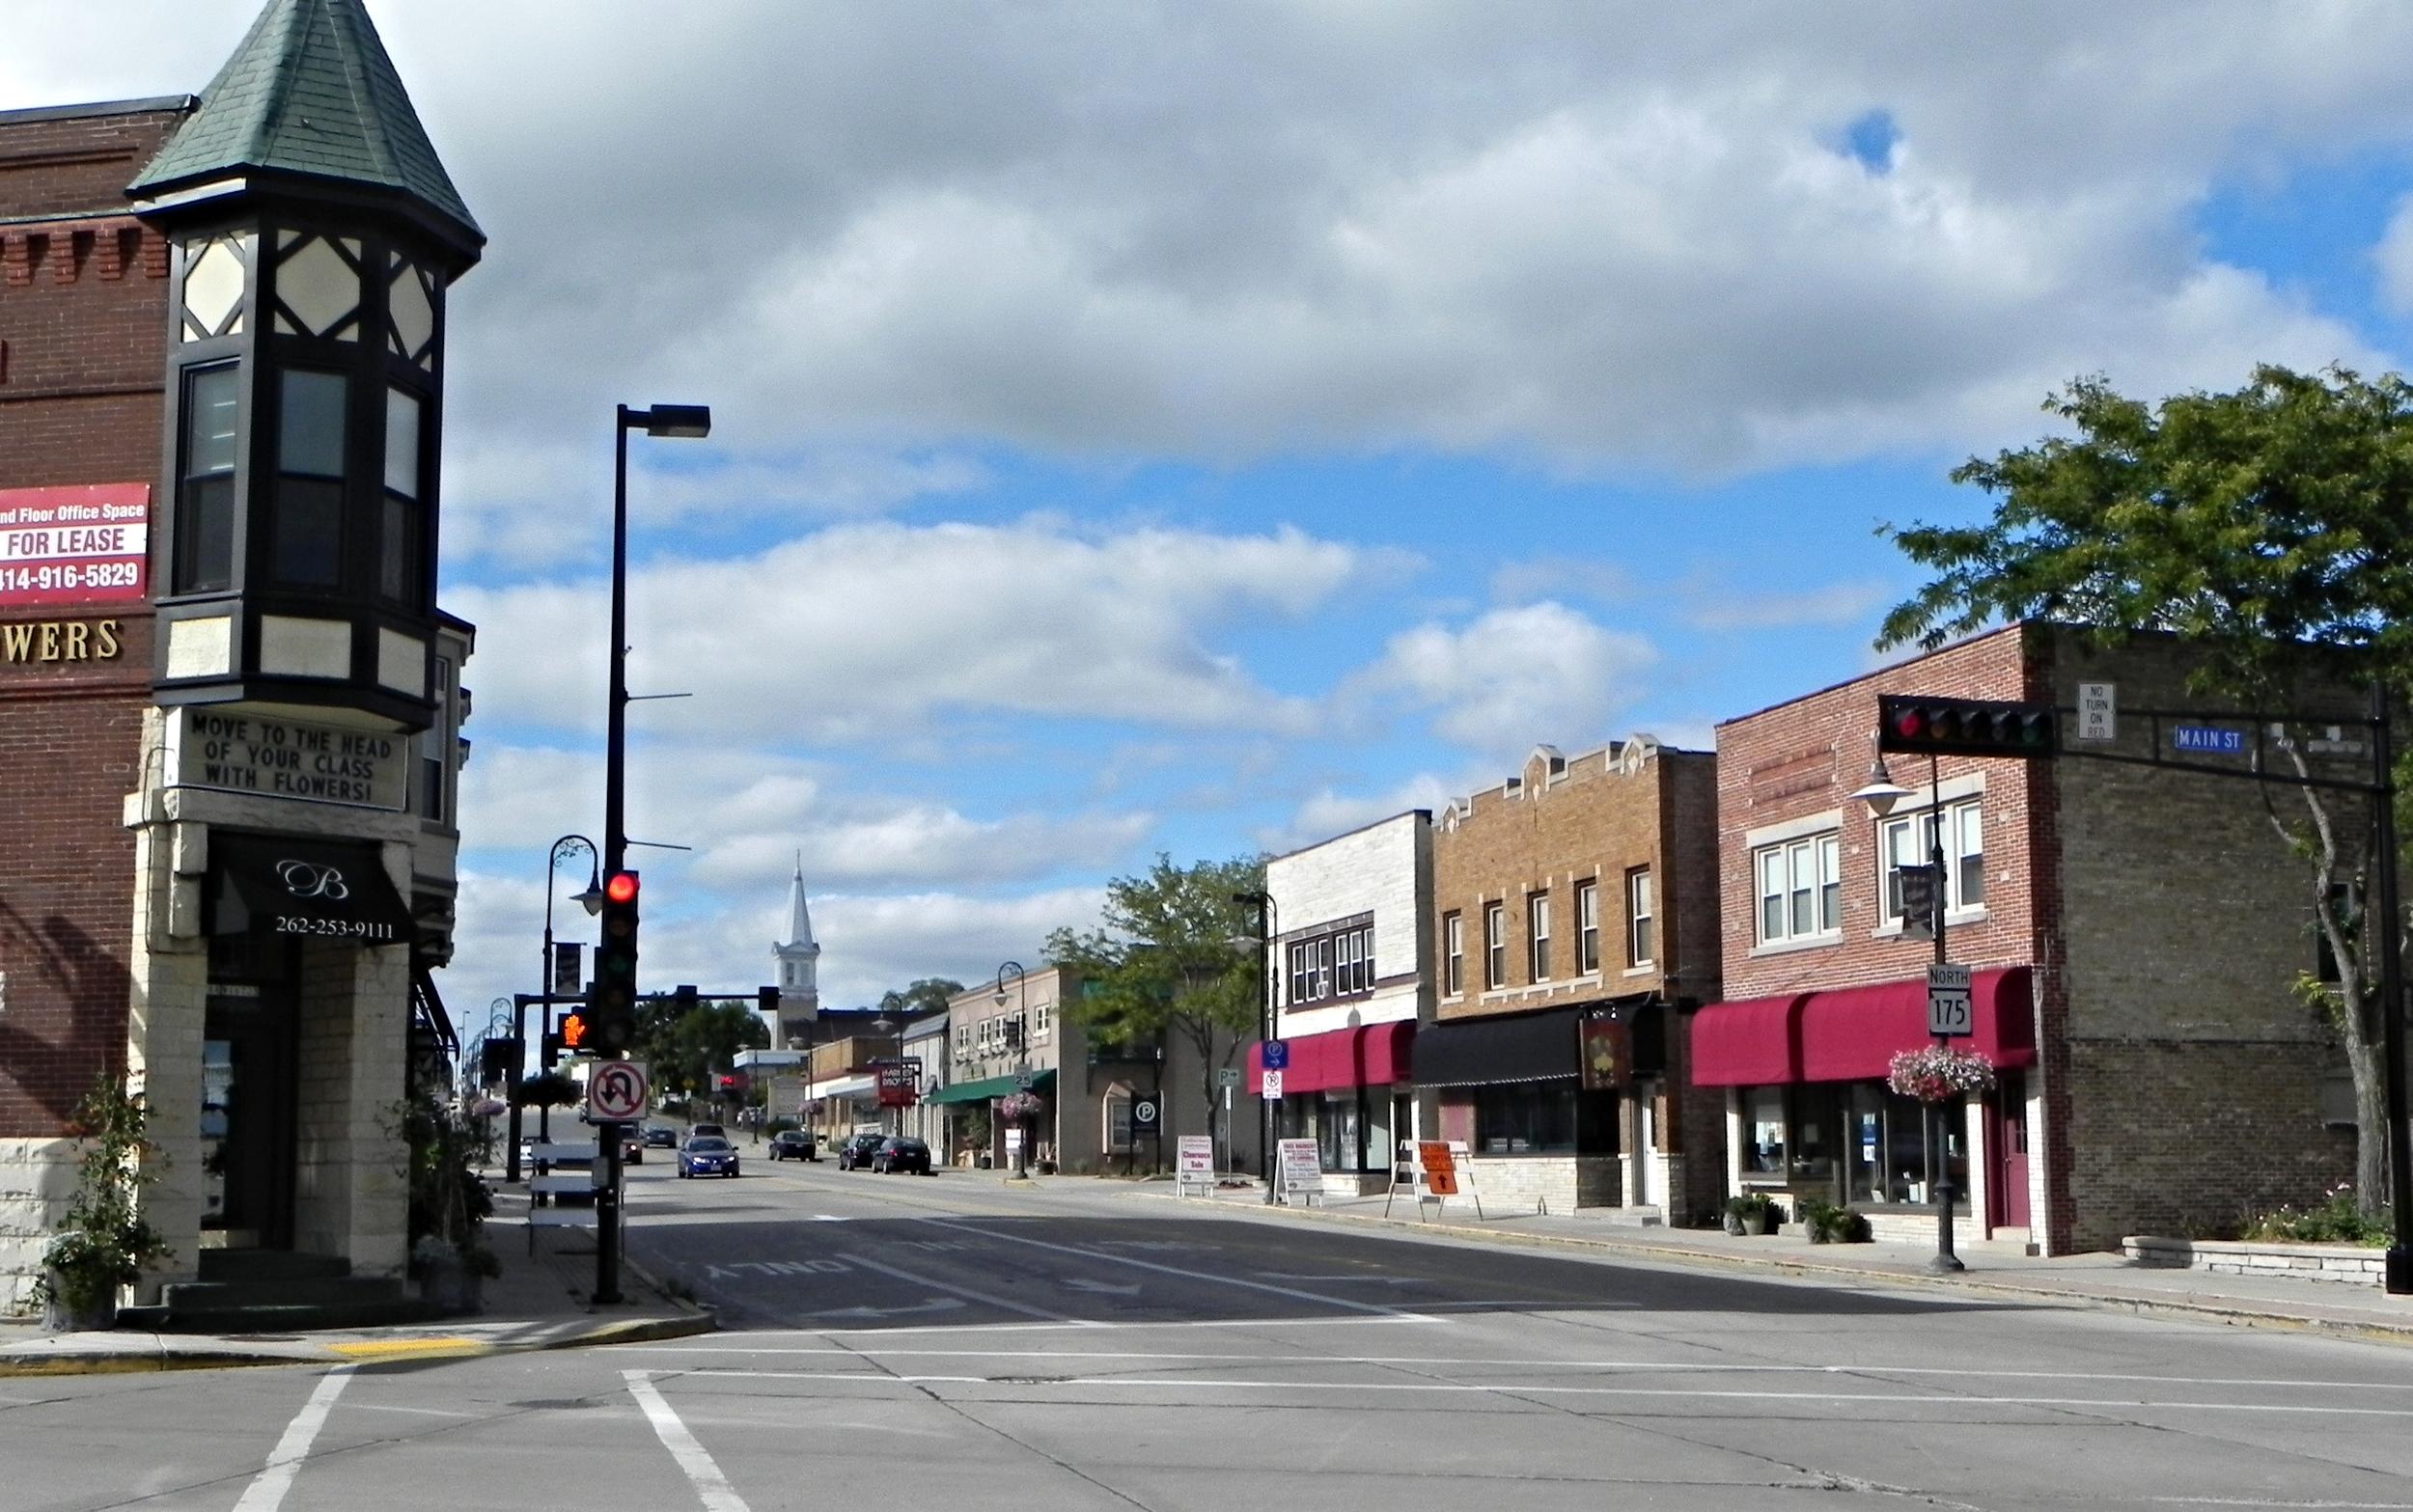 Main_Street_Historic_District_of_Menomonee_Falls,_WI.JPG